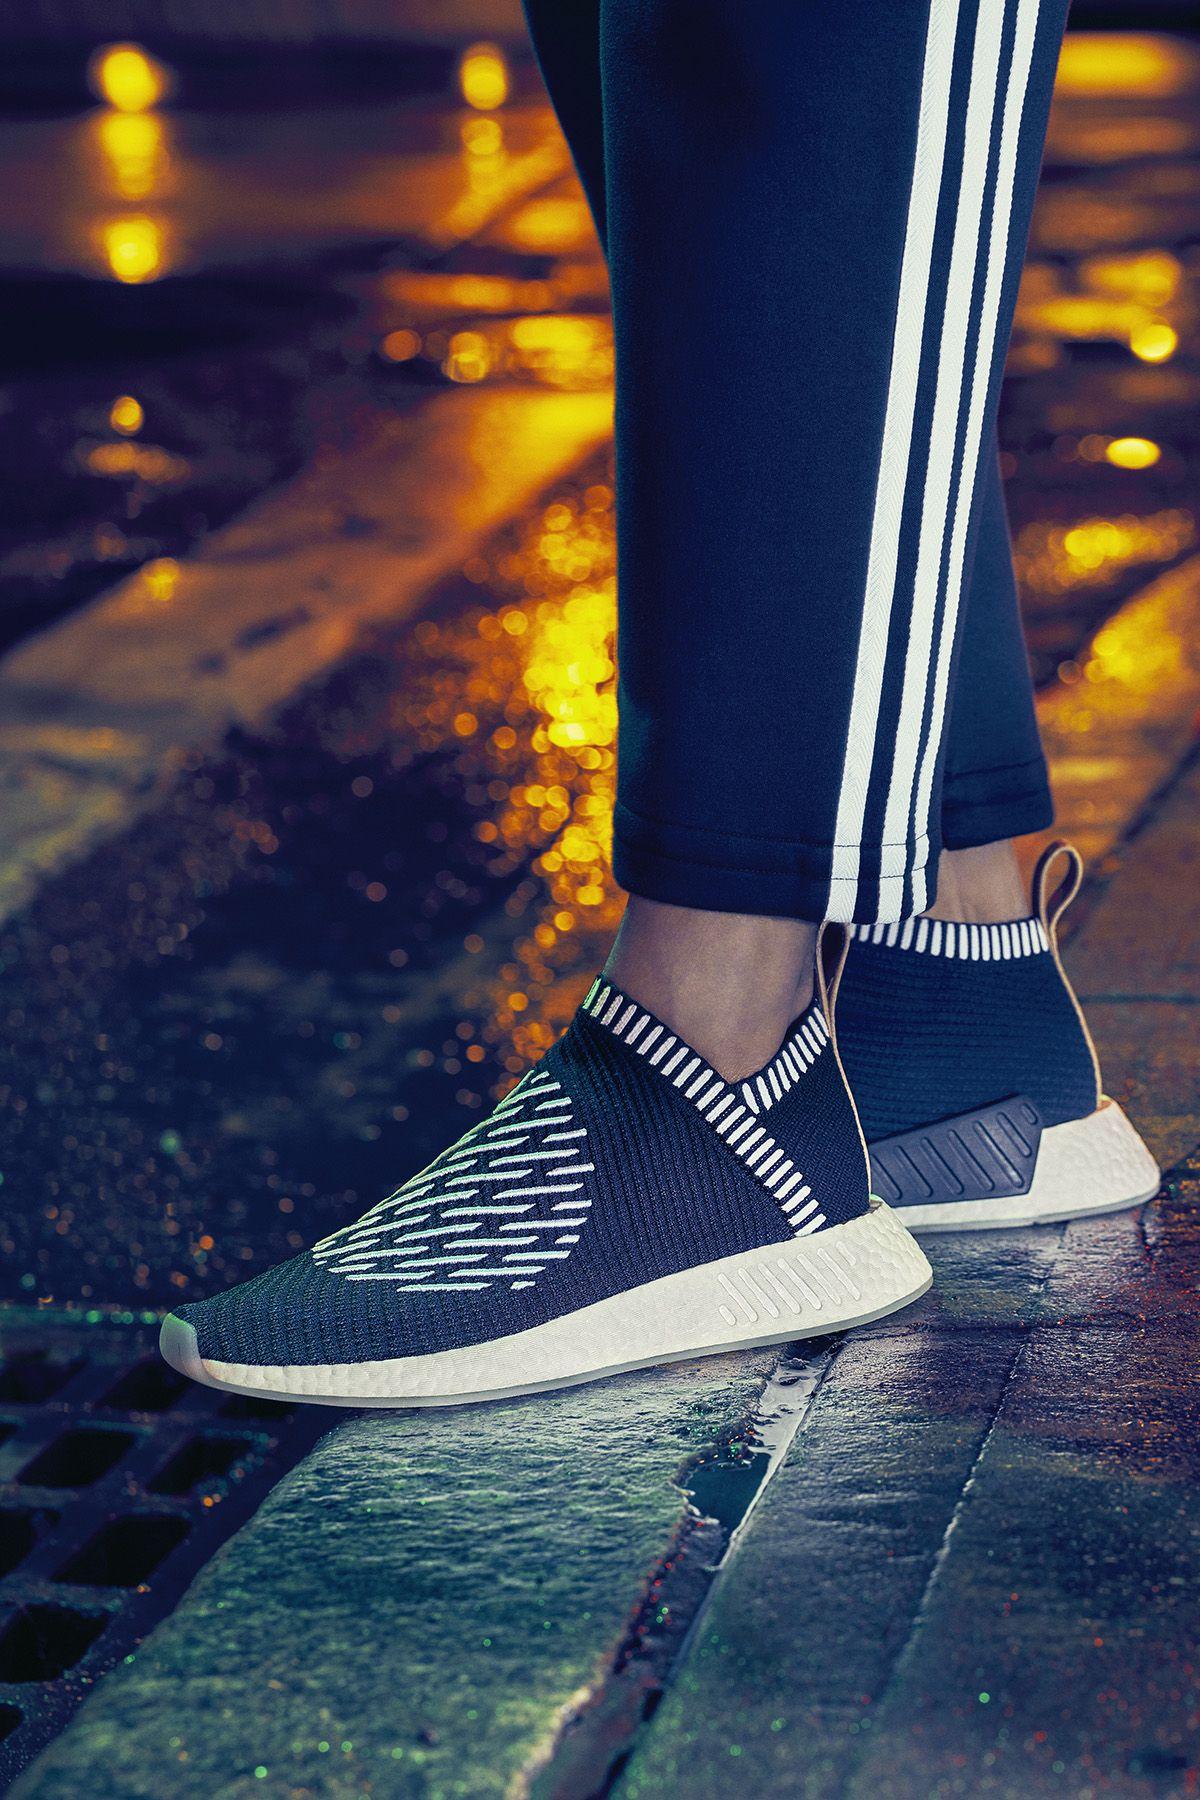 size 40 c4824 37766 adidas Originals NMD CS2 Ronin Pack - EU Kicks  Sneaker Magazine